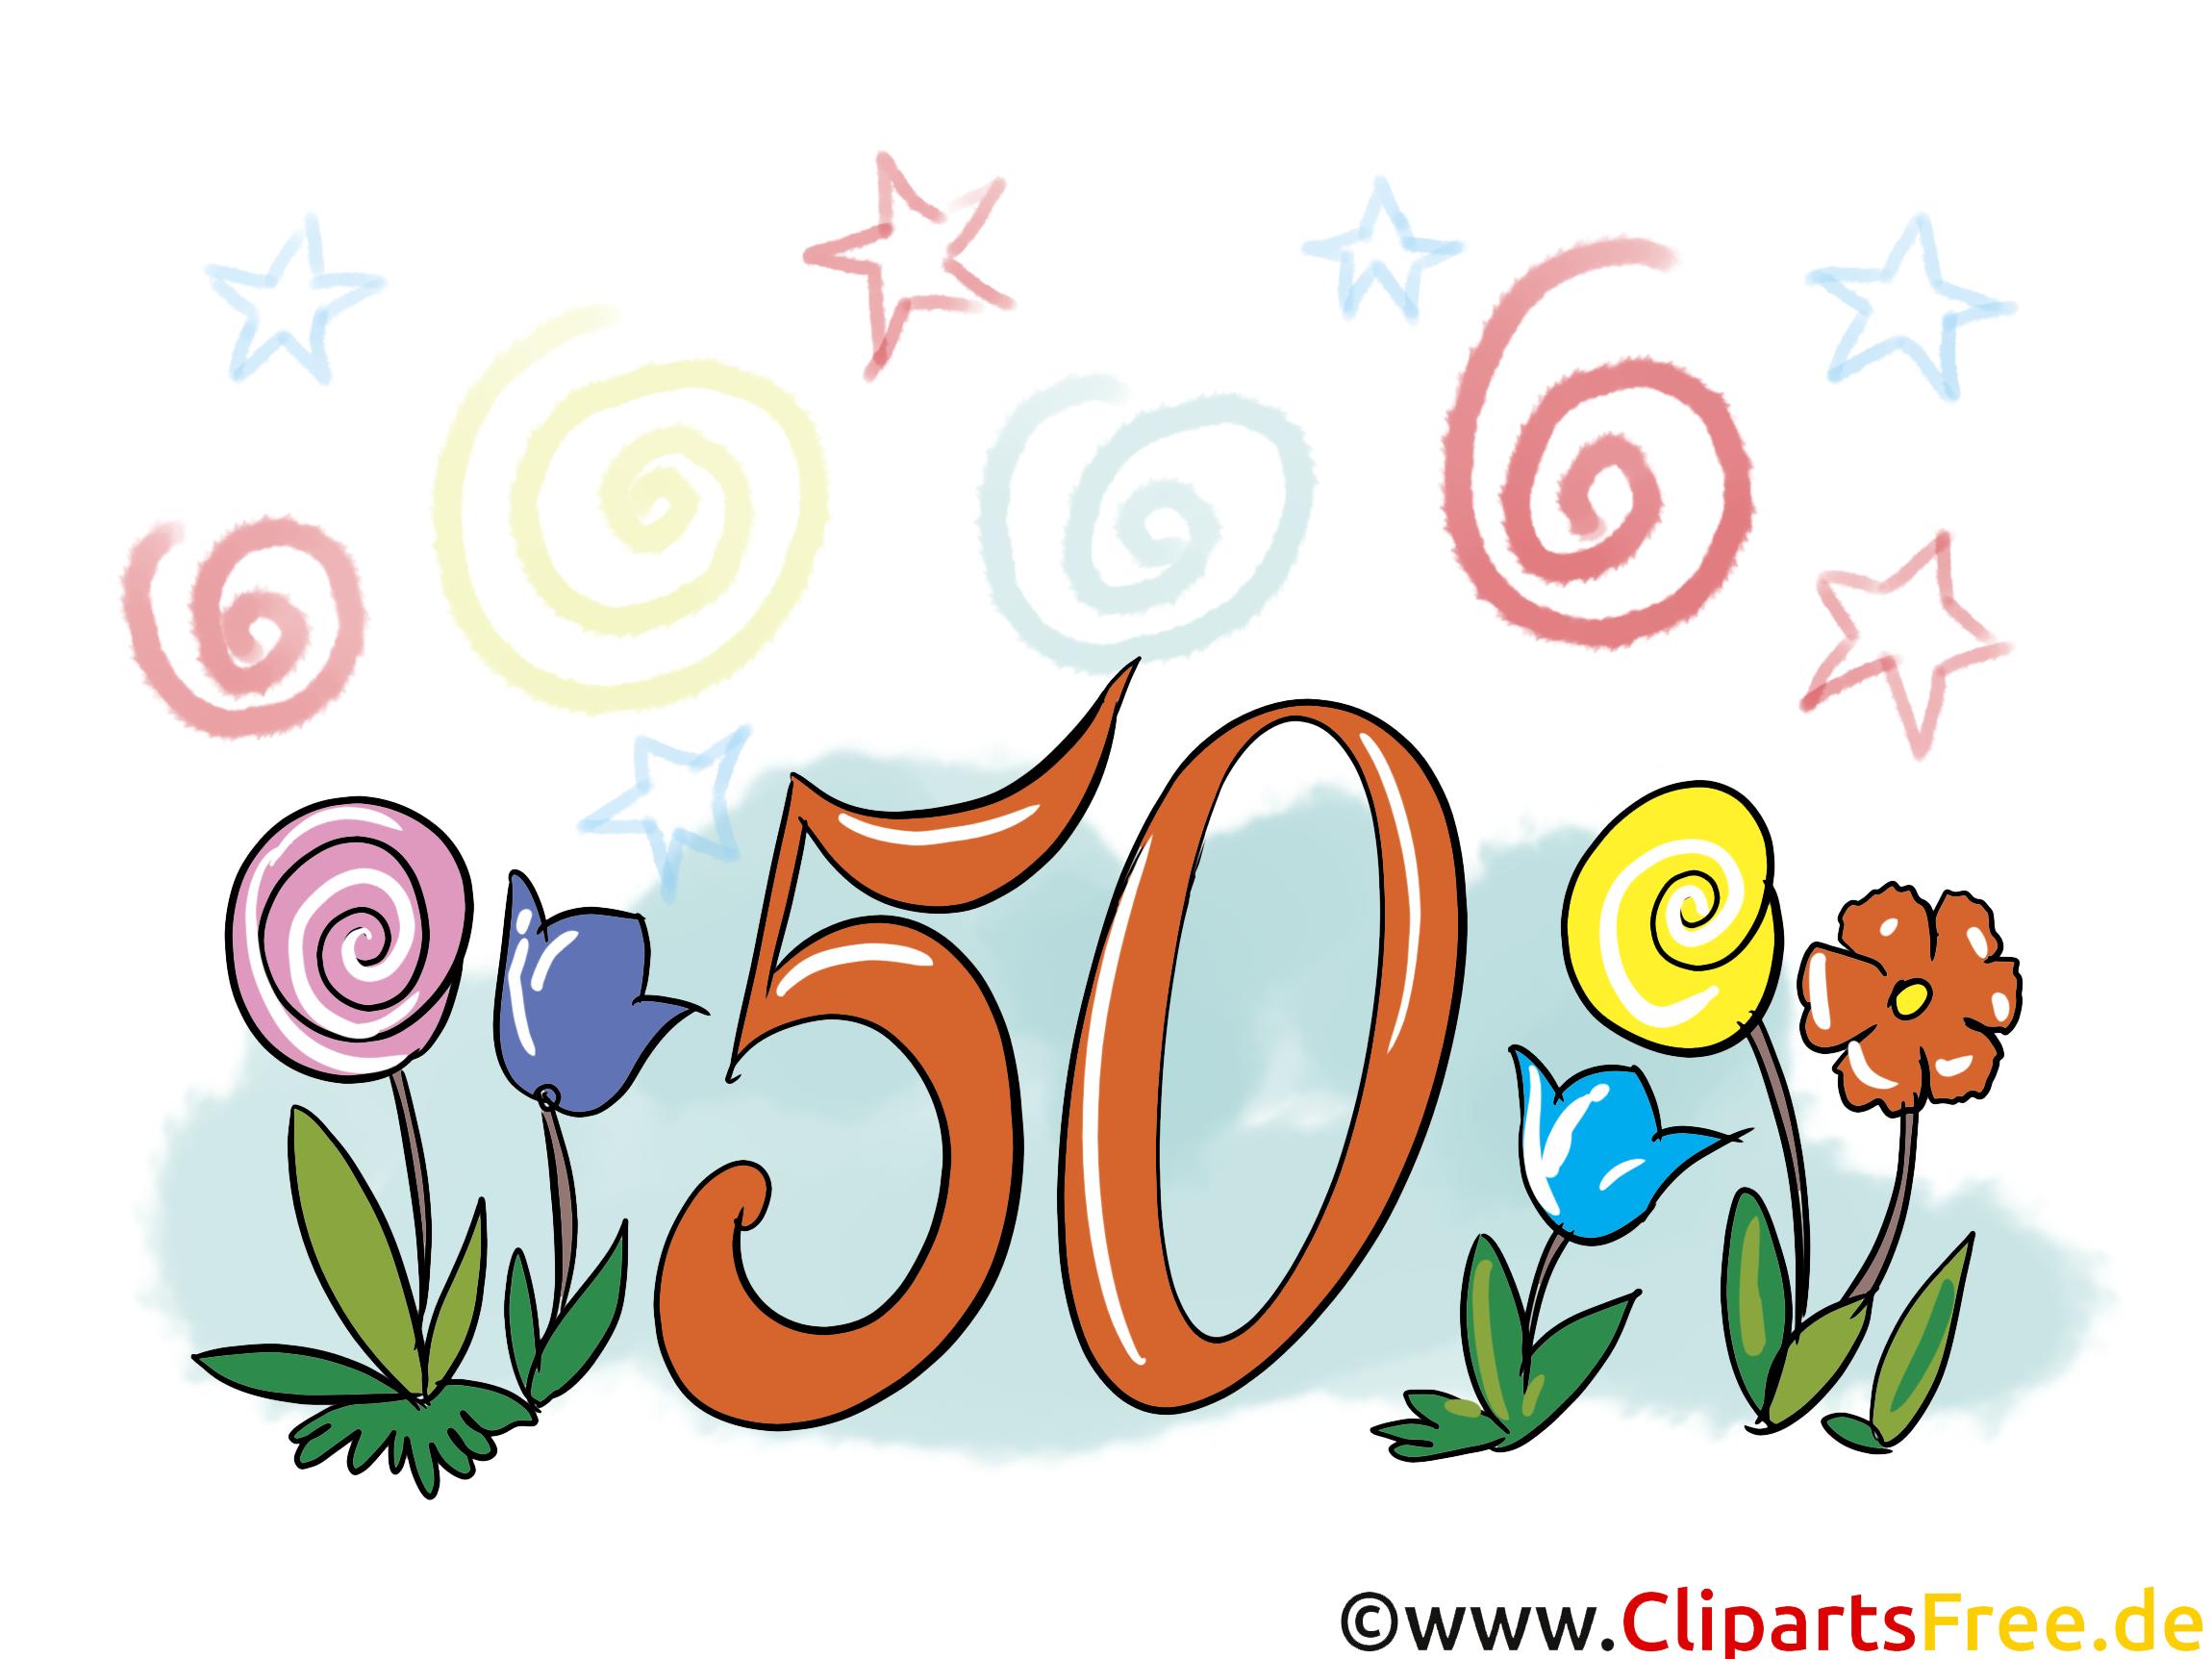 80 ans clipart graphic transparent stock 50 ans clipart - ClipartFest graphic transparent stock